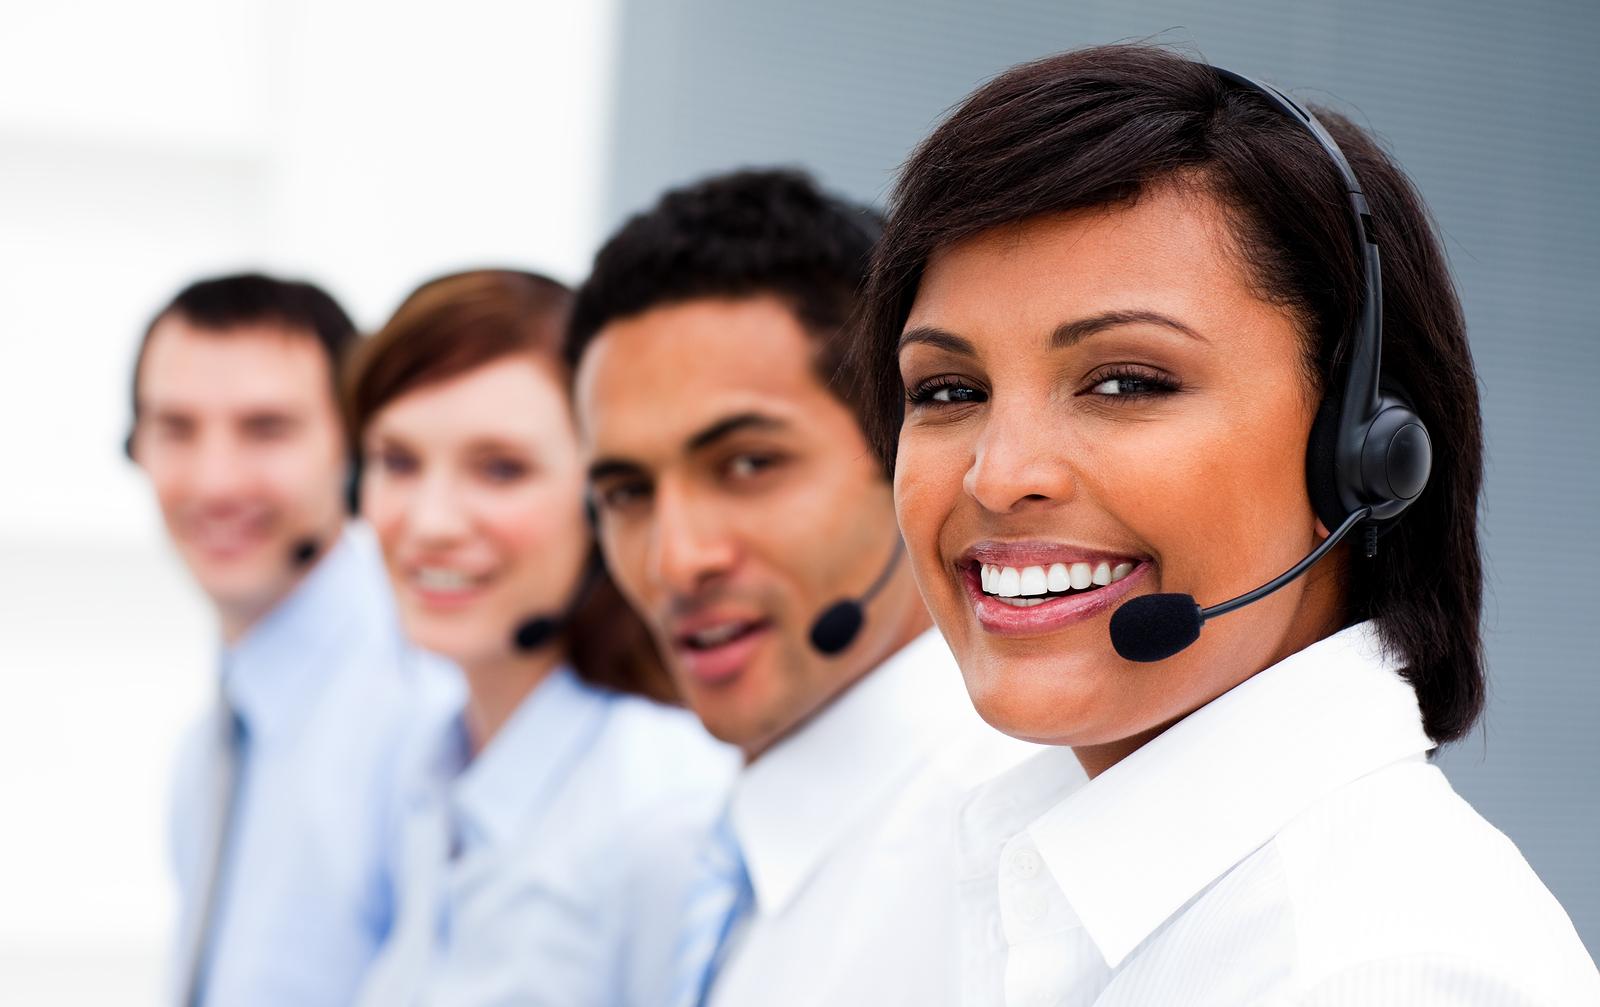 bigstock-customer-service-reps-6479294_67802.jpg